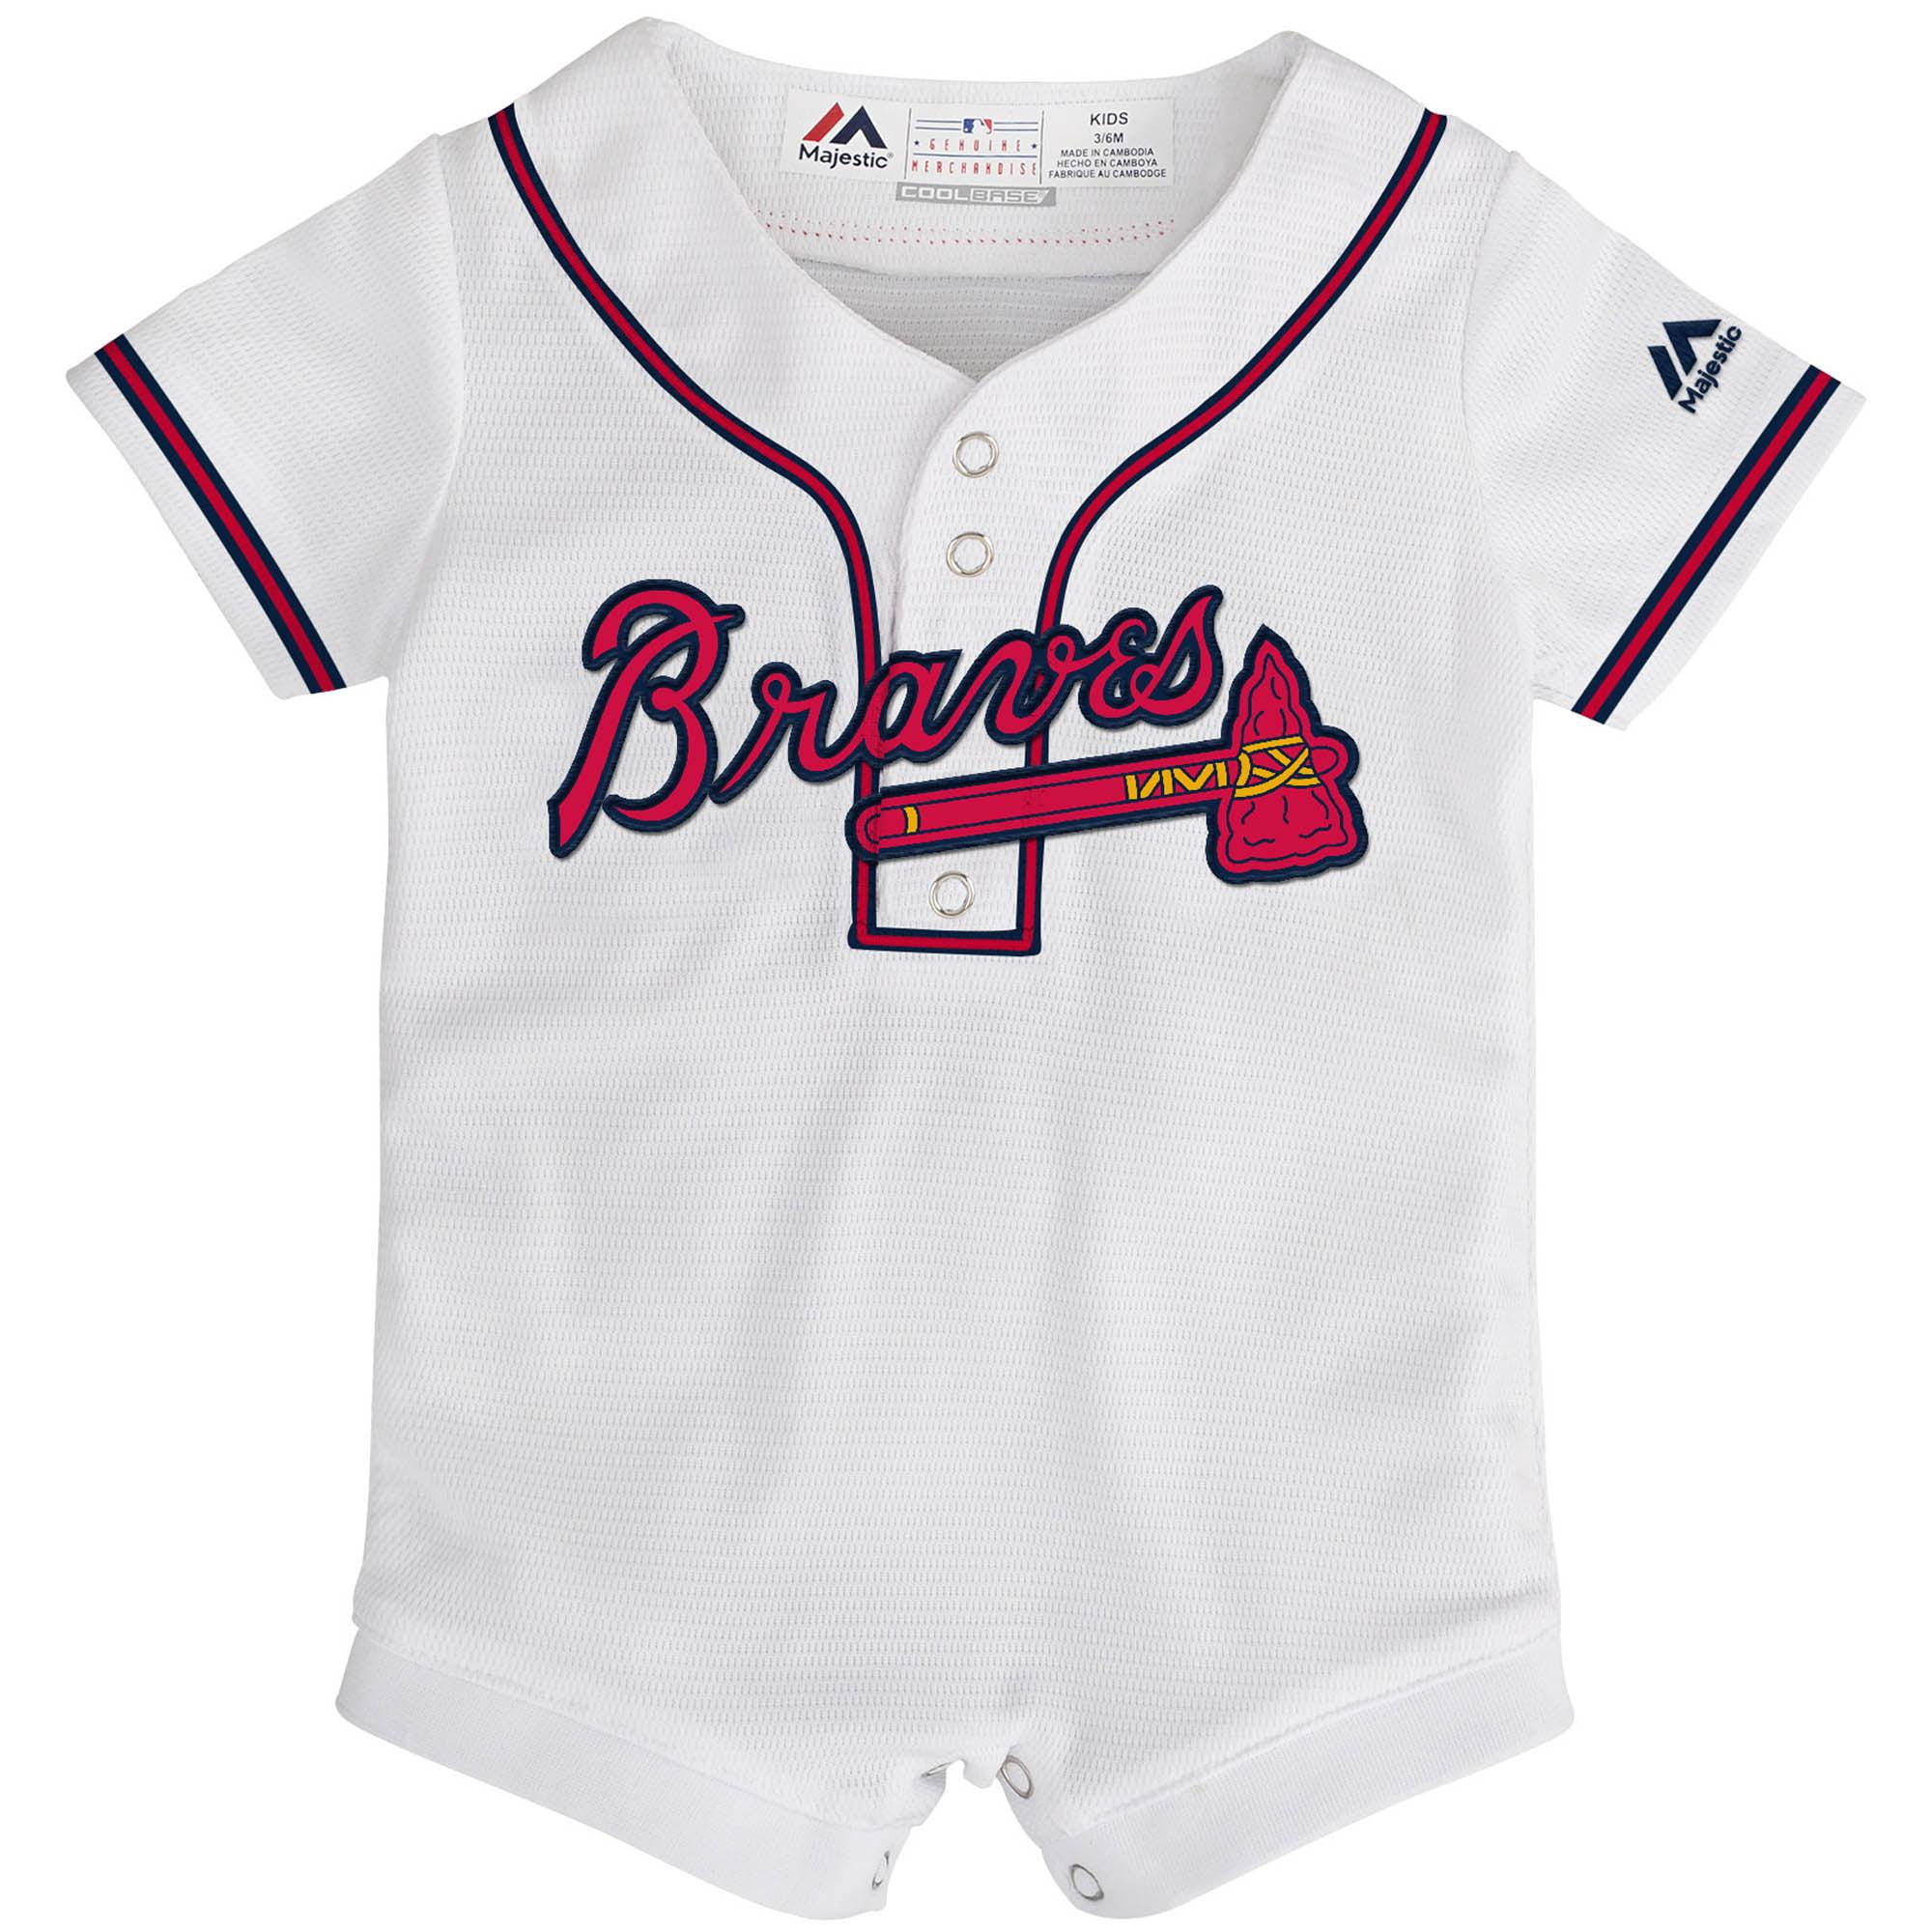 sale retailer 5ab6a c6983 Atlanta Braves Majestic Newborn & Infant Home Cool Base Jersey Romper -  White